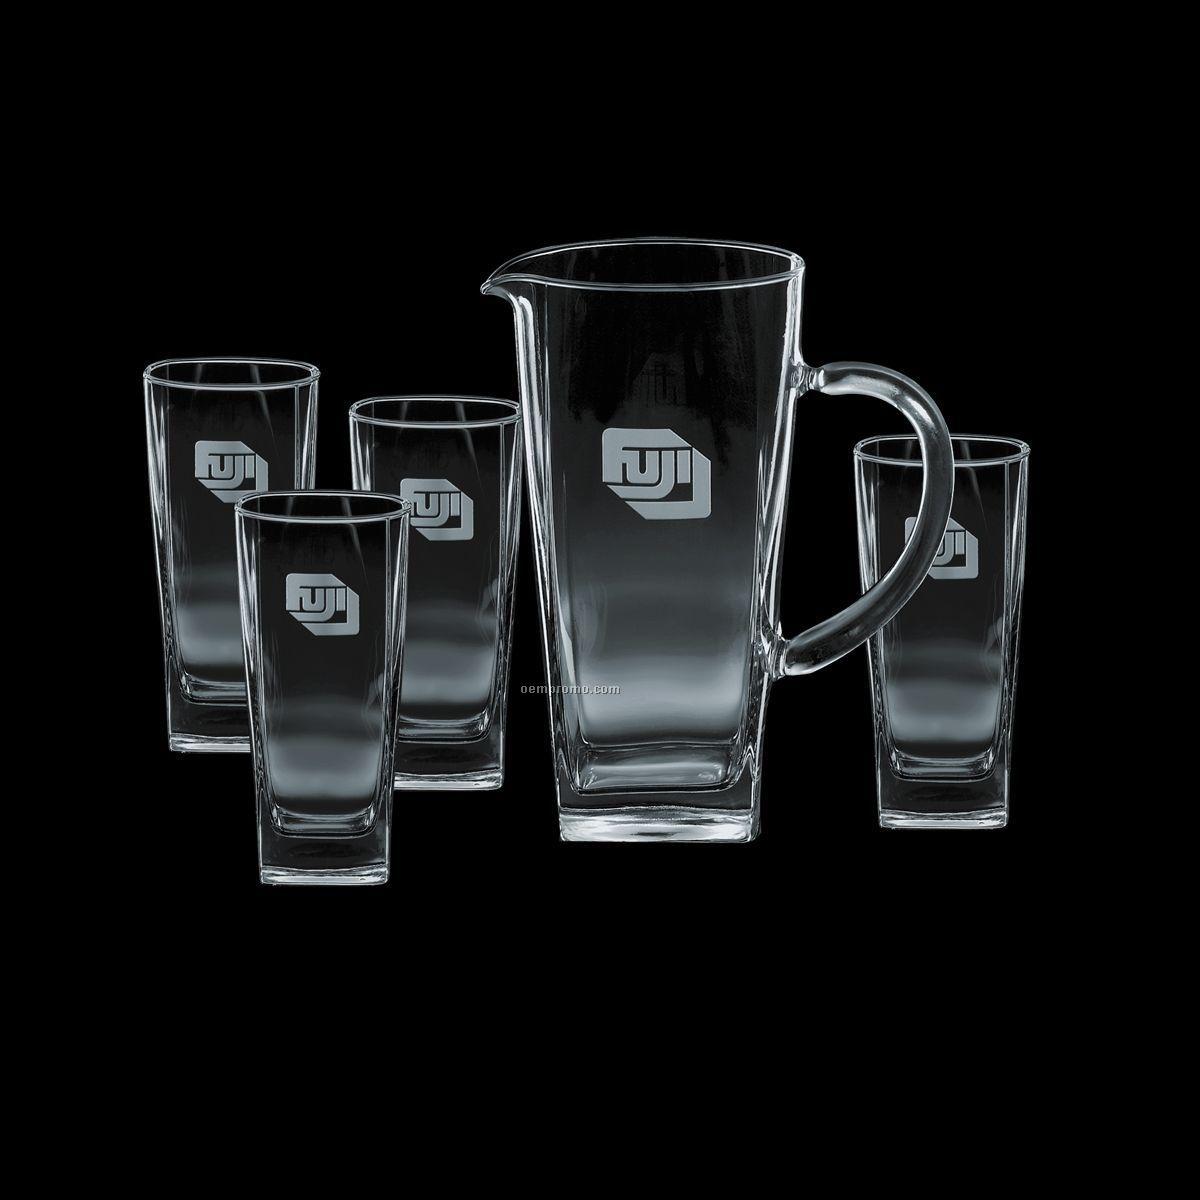 43 Oz. Sterling Pitcher & 4 Hiball Glasses